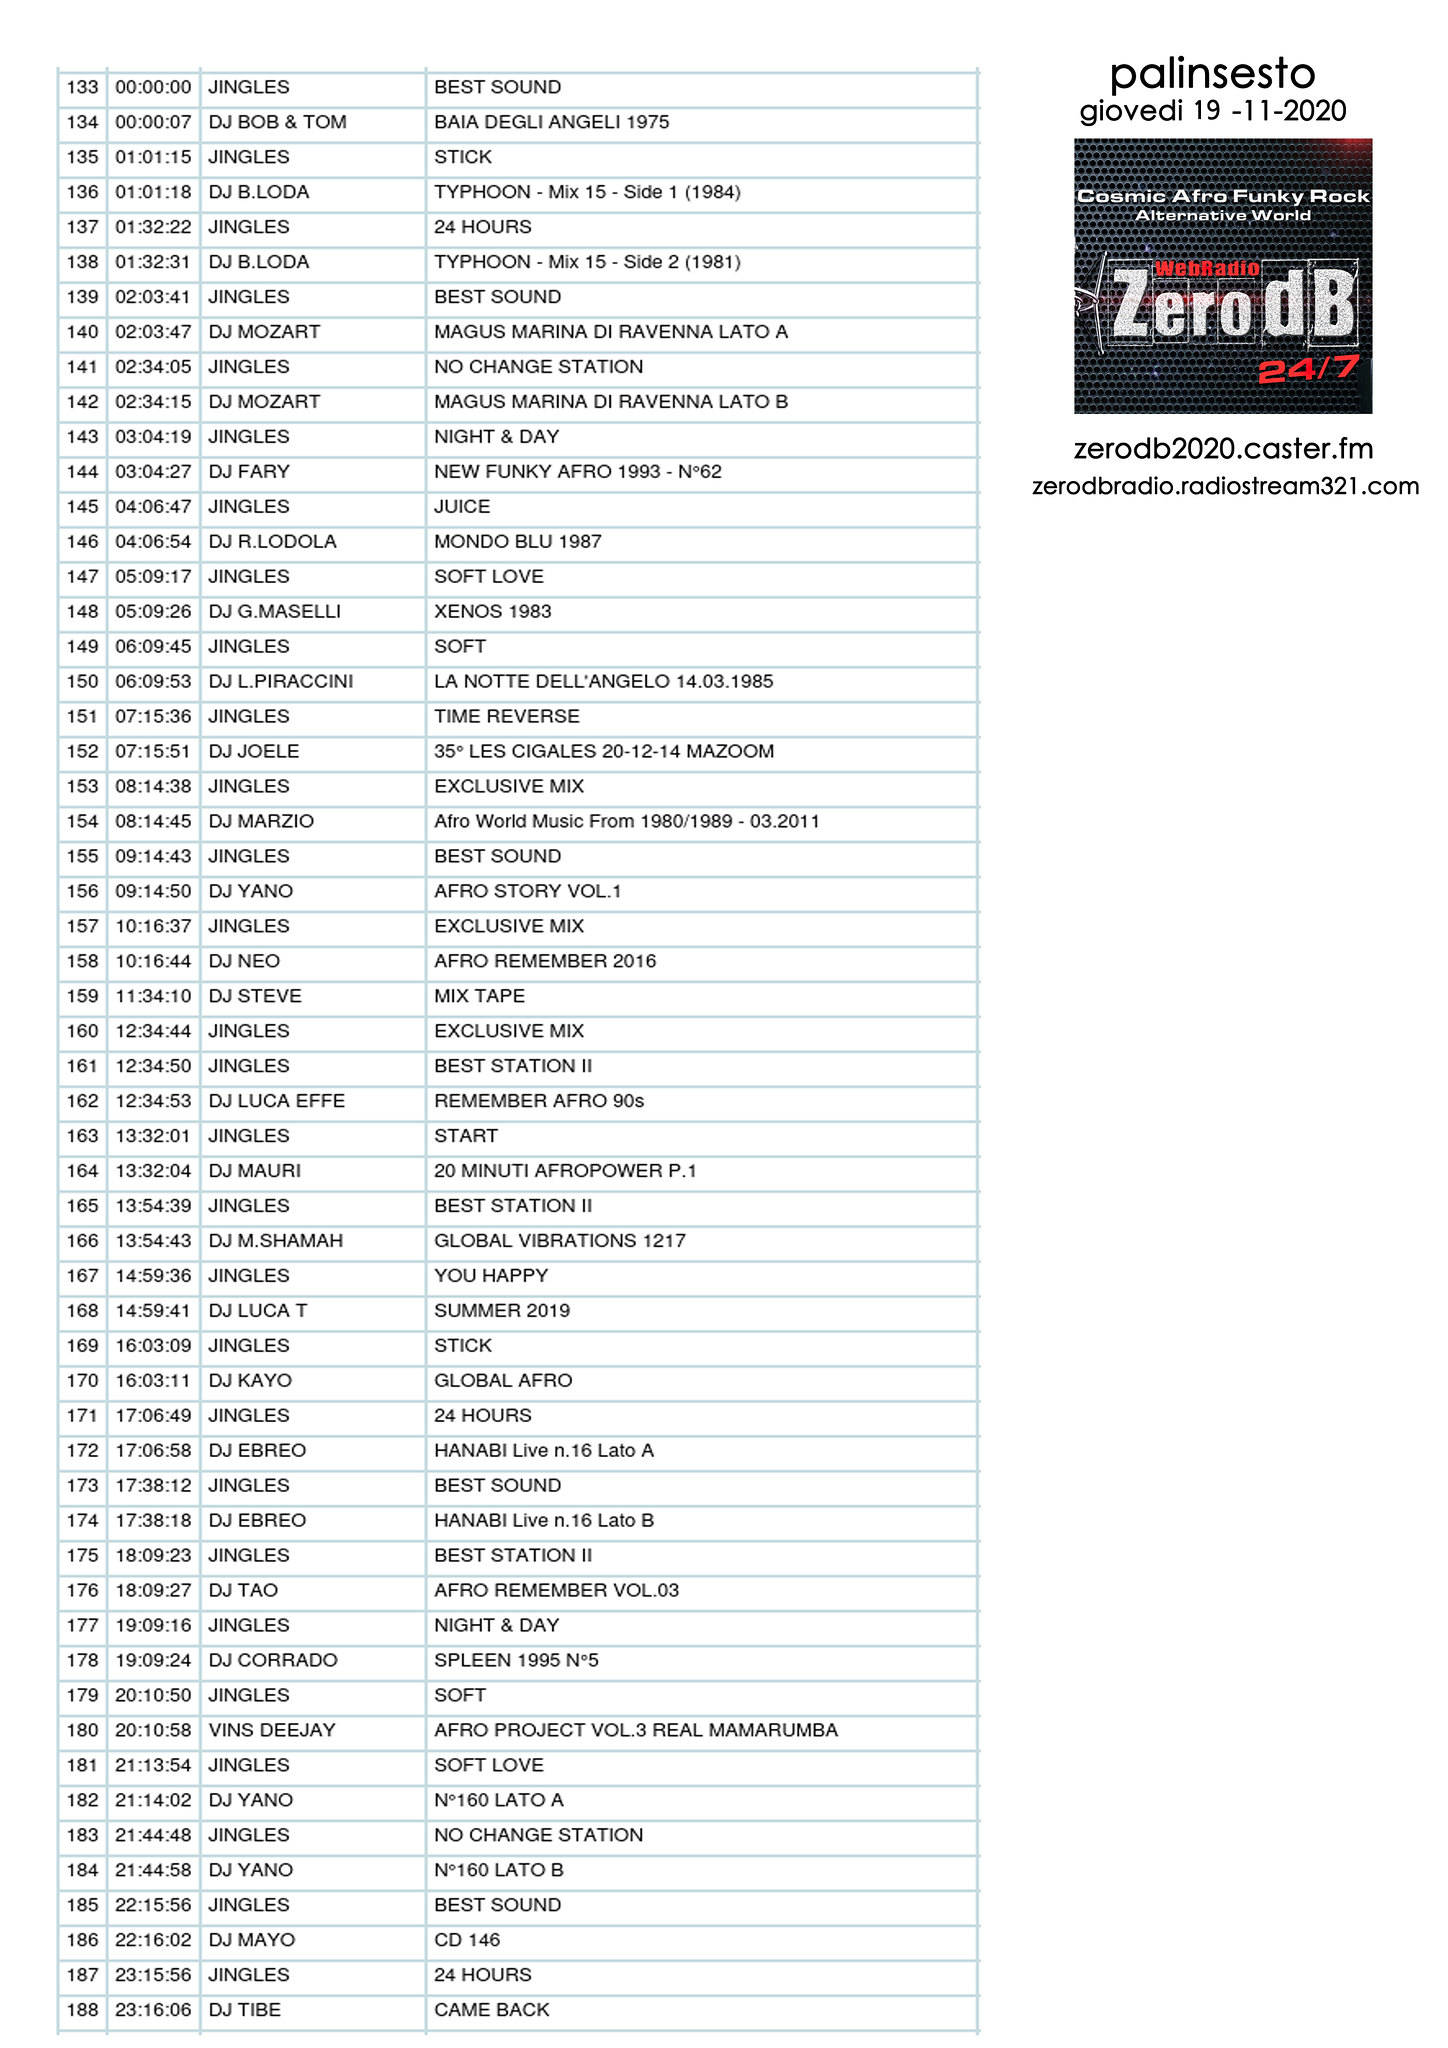 zerodb 19-11-2020